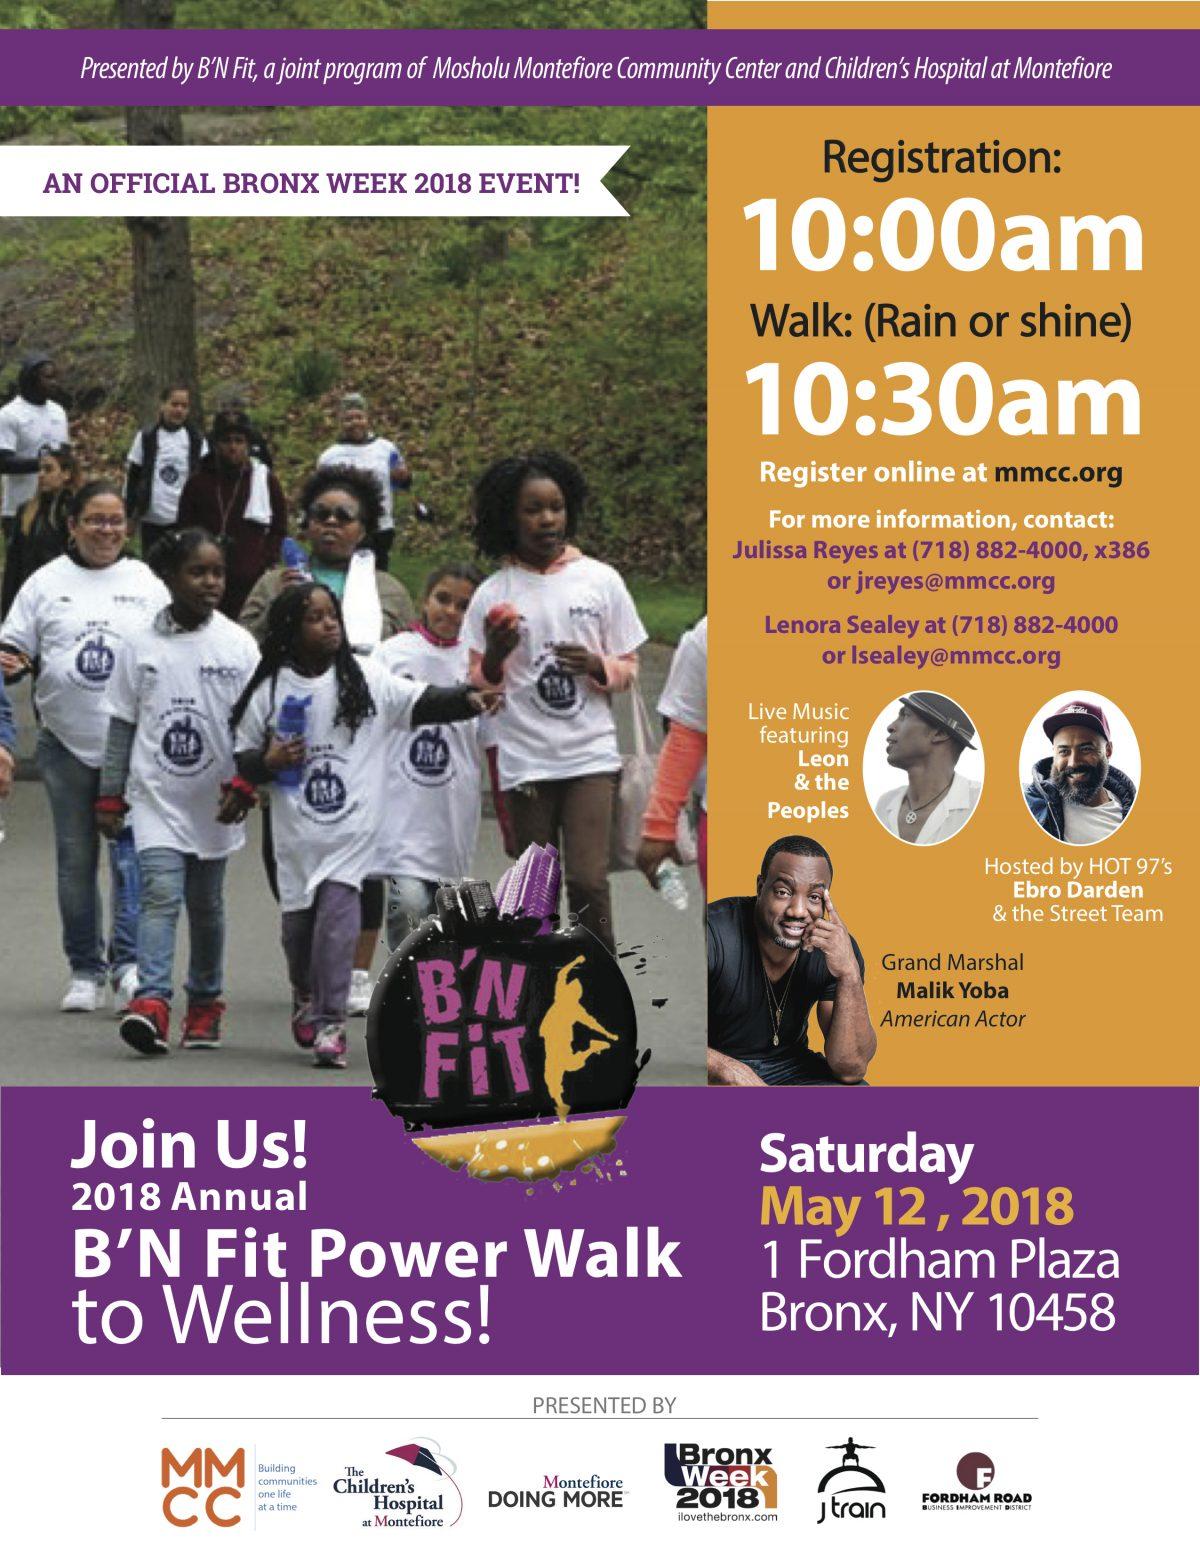 B'N Fit Power Walk to Wellness